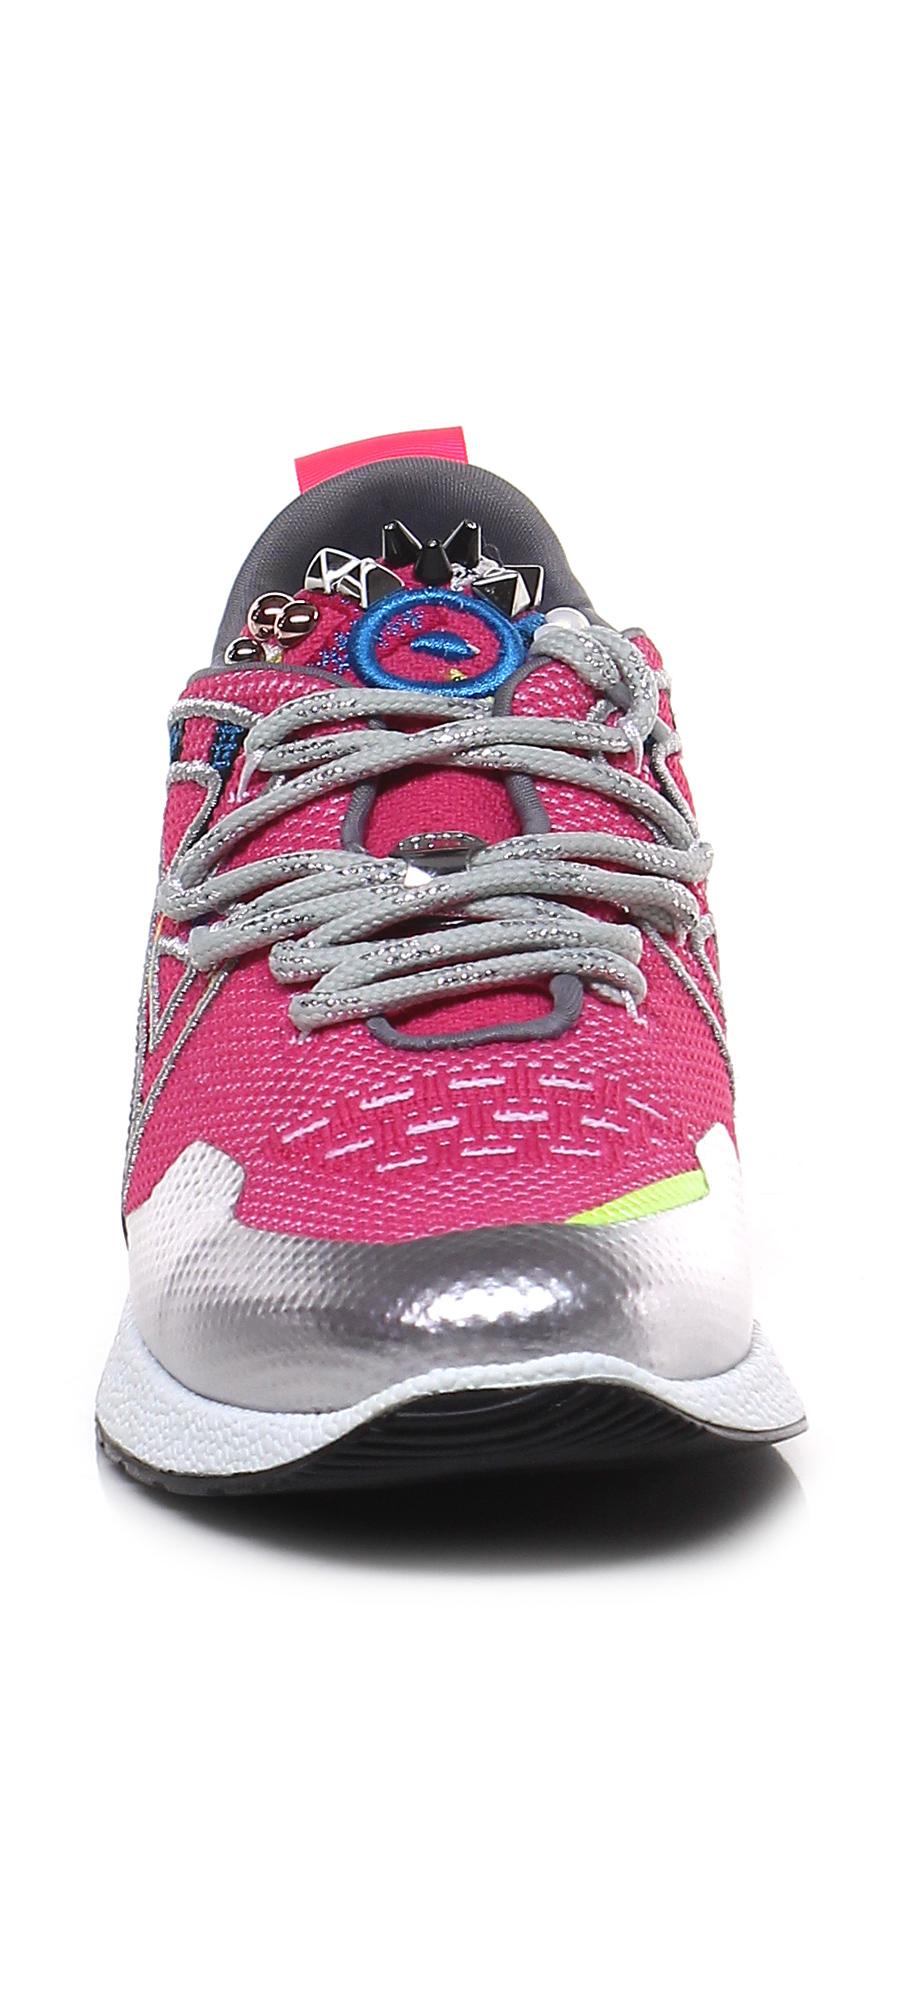 Sneaker Rosa/argento Barracuda Verschleißfeste billige Schuhe